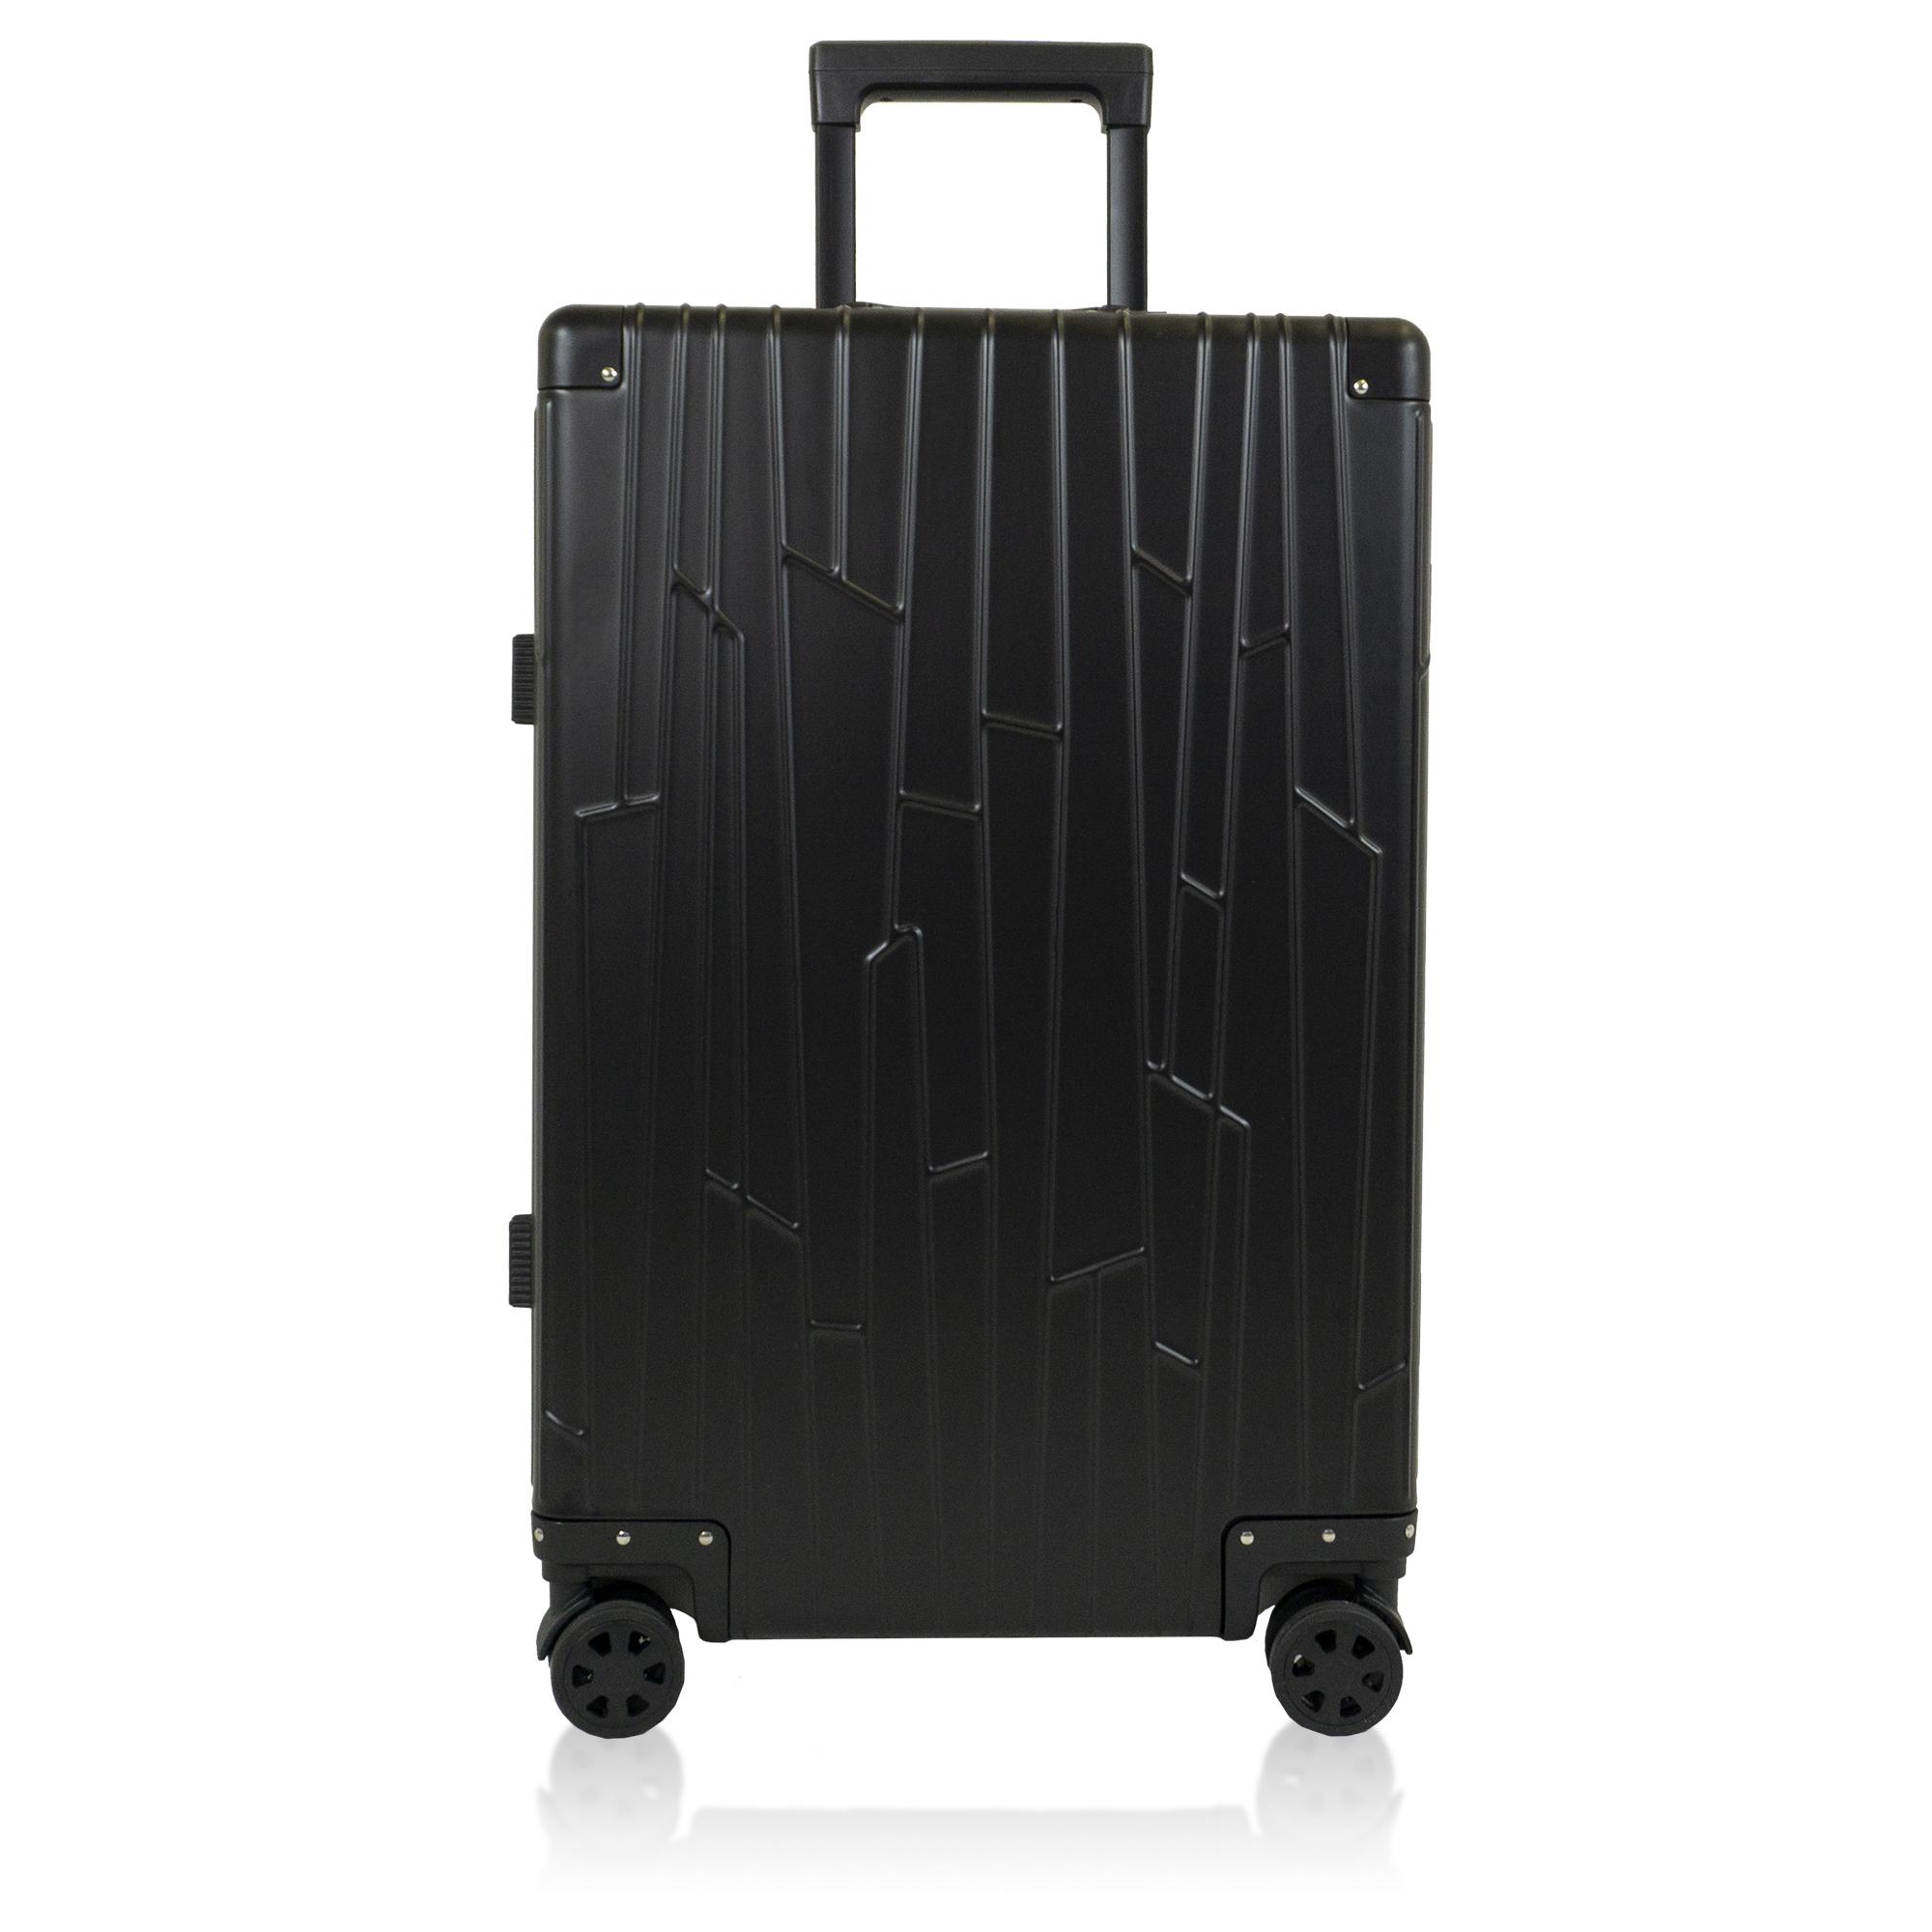 Check-in KOM-001W black aluminium suitcase gundel checked luggage tsa-lockss